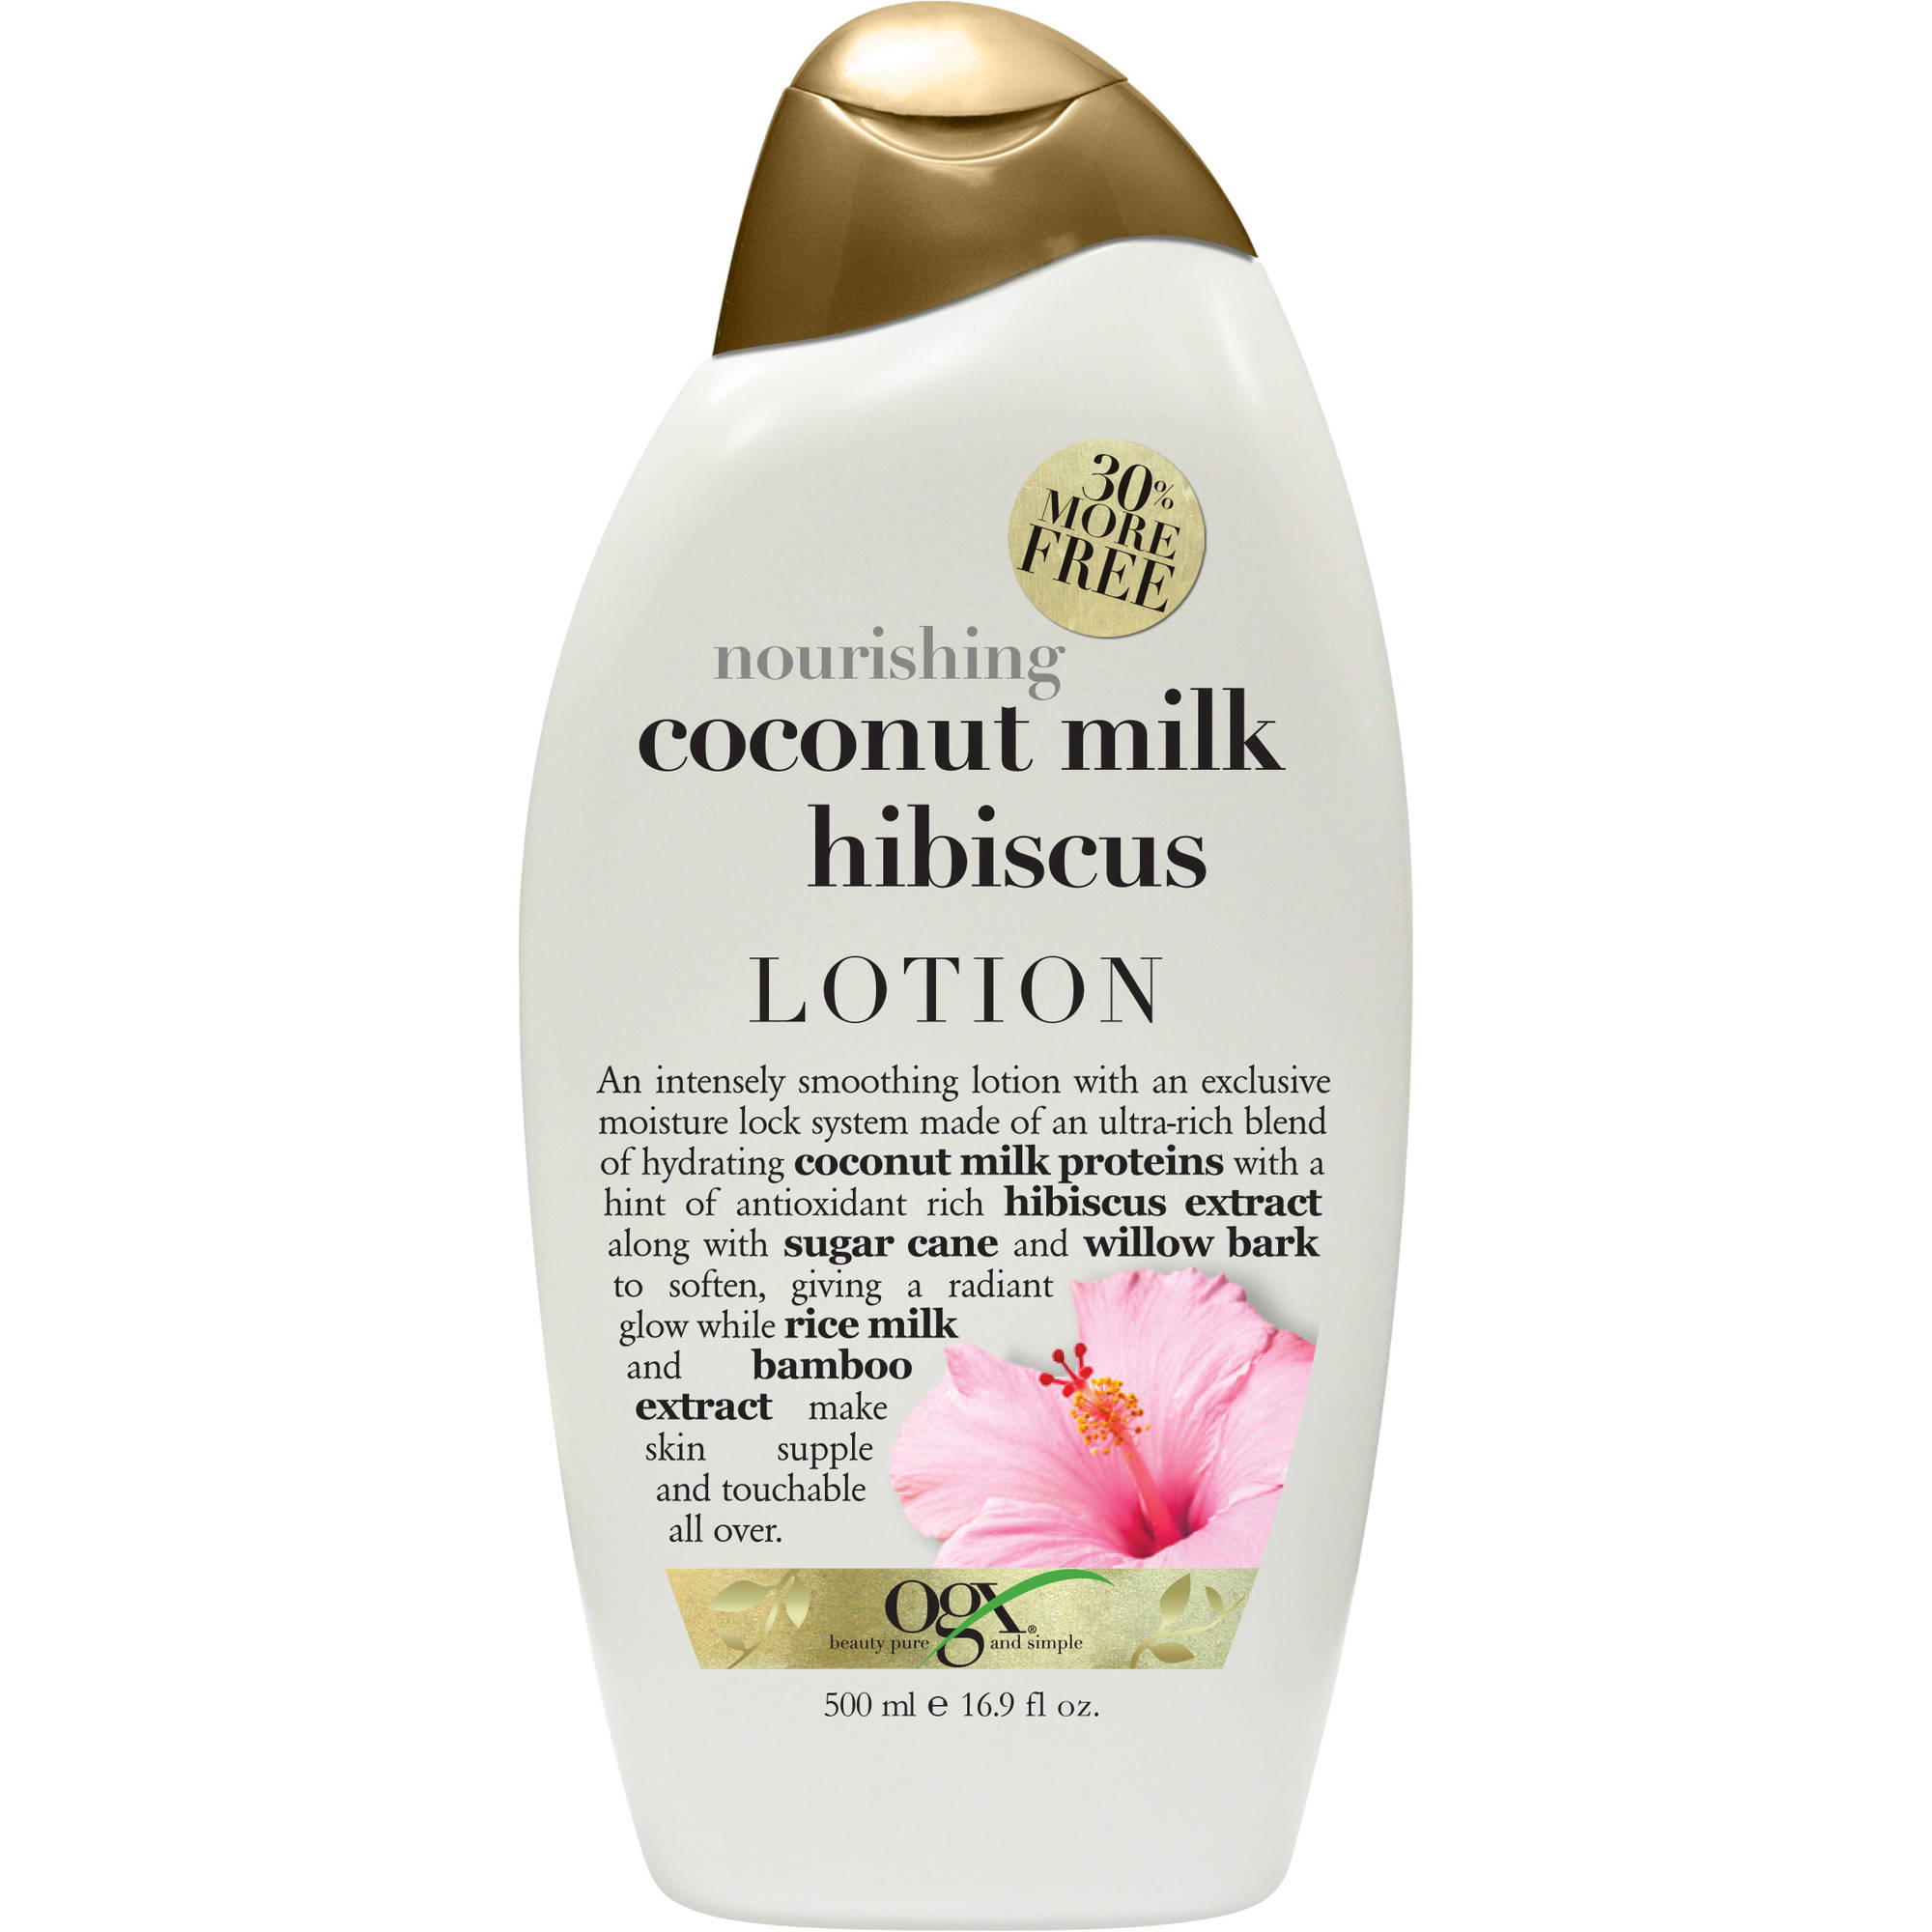 OGX Coconut Milk Hibiscus Lotion, 16.9 fl oz